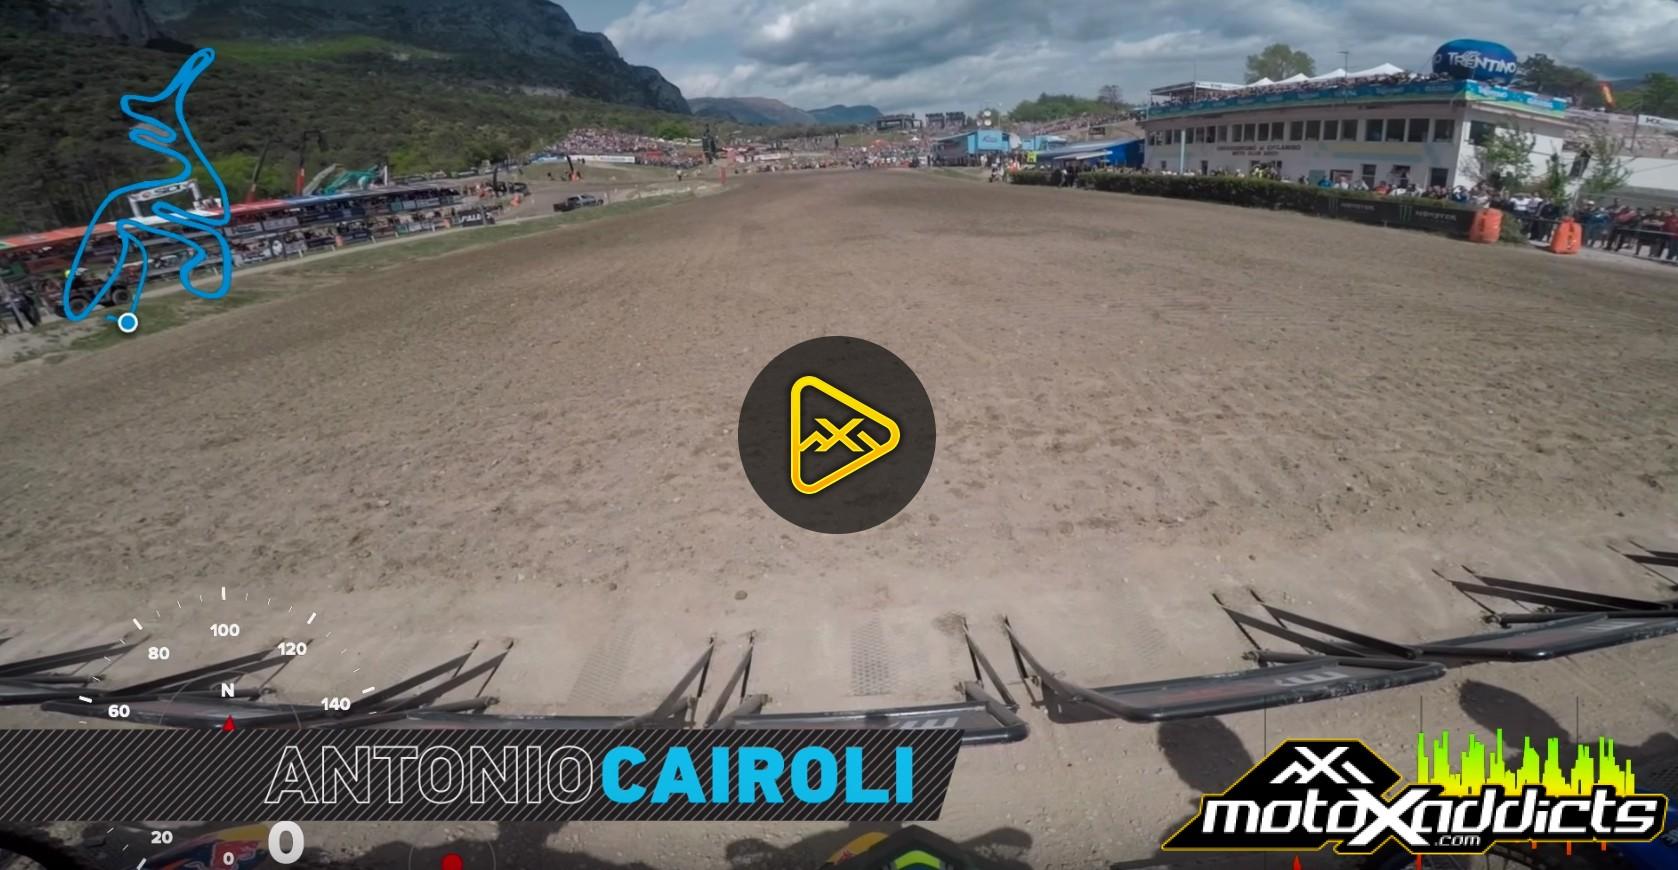 GoPro: Antonio Cairoli Moto 1 – 2017 MXGP of Trentino